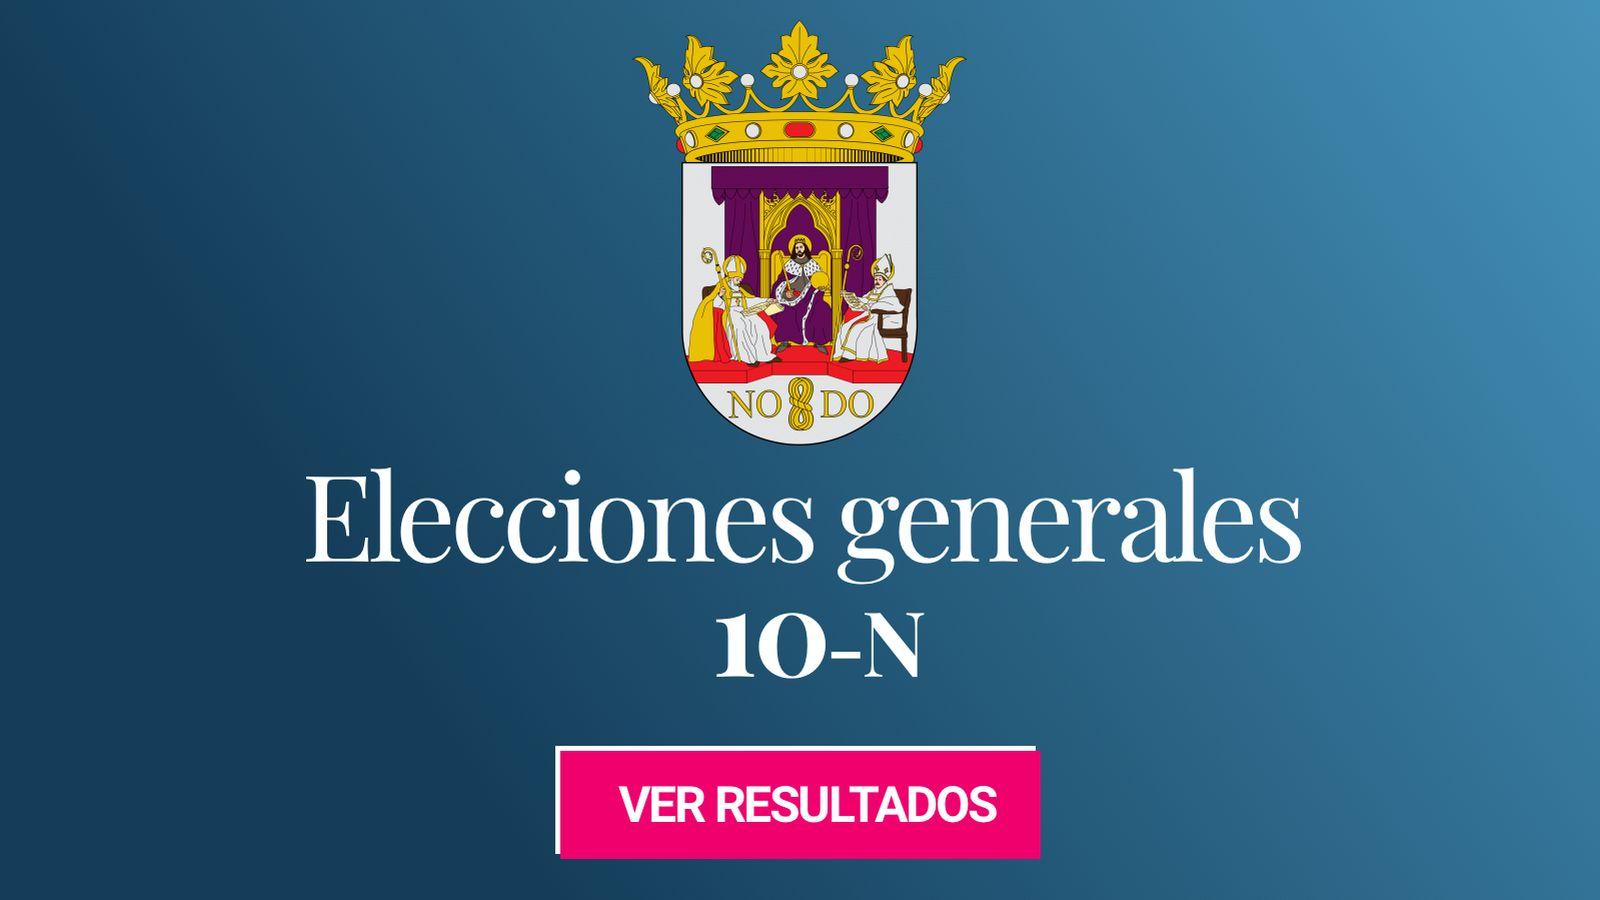 Foto: Elecciones generales 2019 en Sevilla. (C.C./EC)